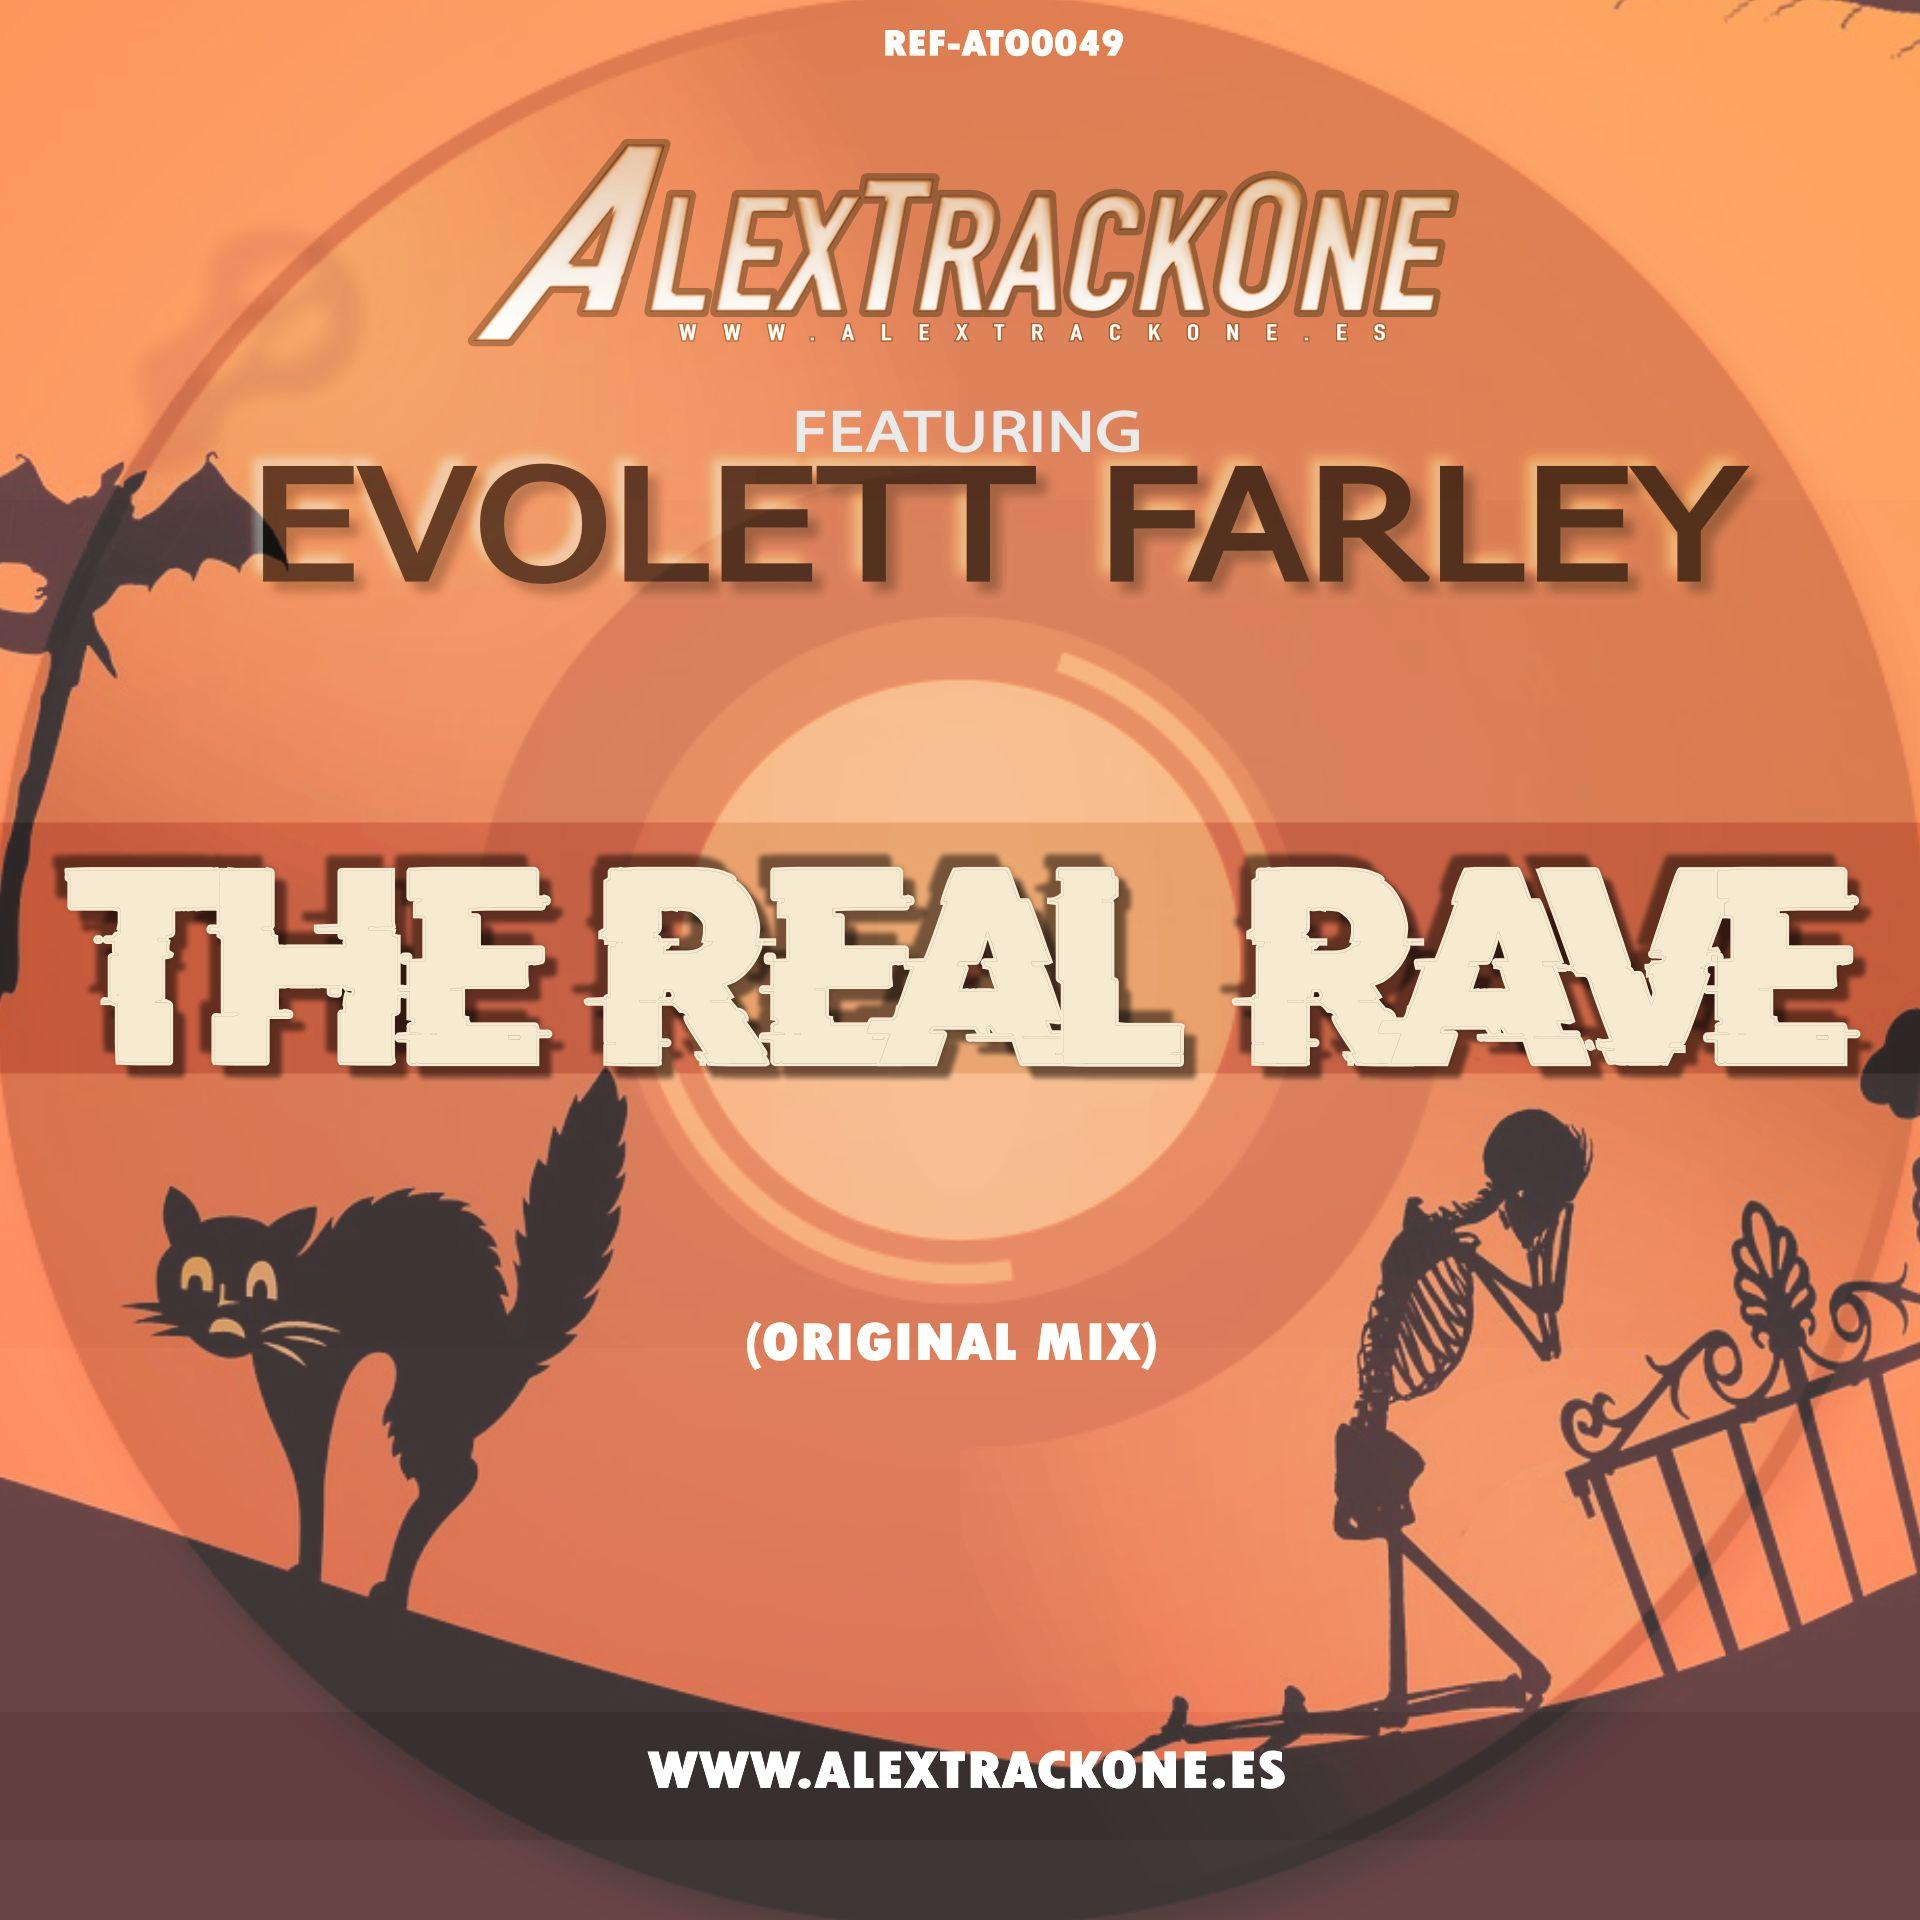 REF-ATO0049 FEAT EVOLETT FARLEY THE REAL RAVE (ORIGINAL MIX) (MP3 & WAV)